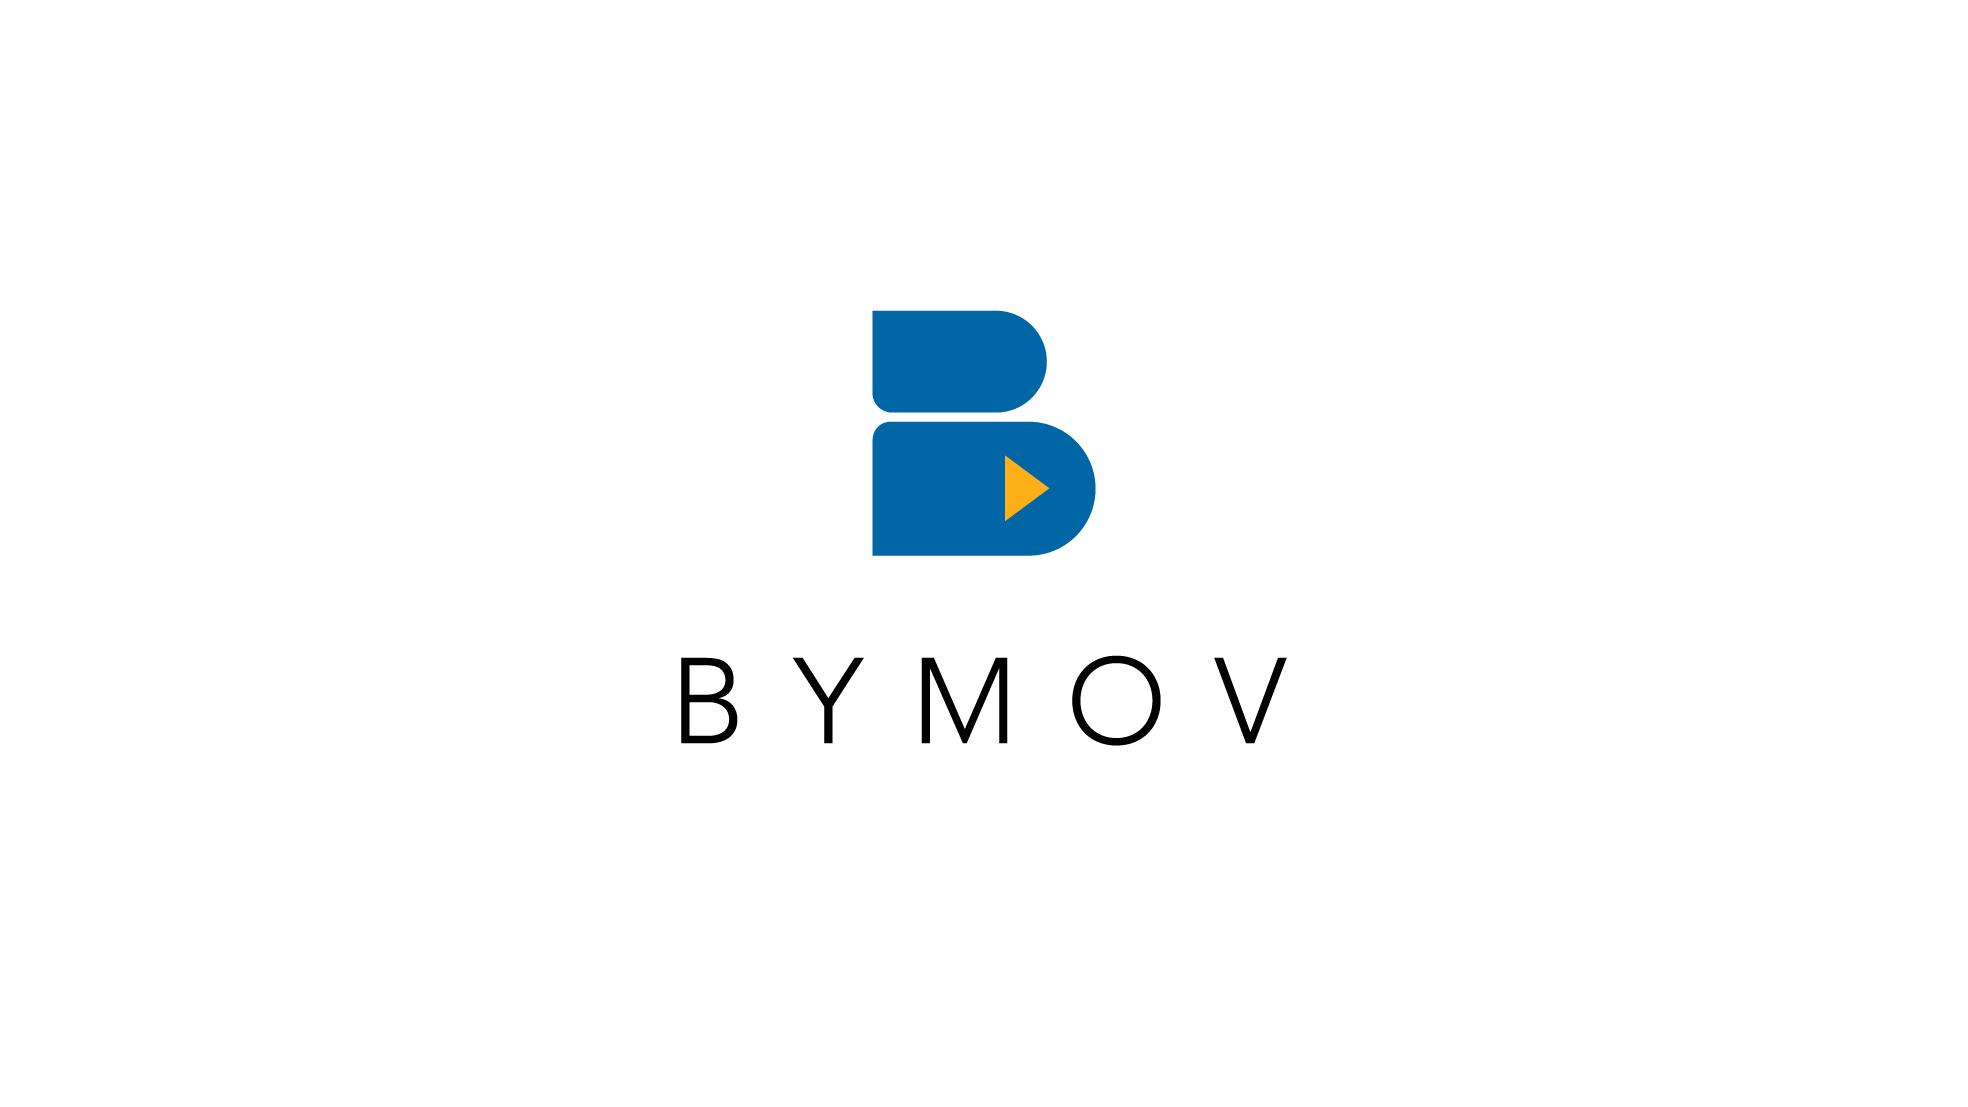 Bymove ID